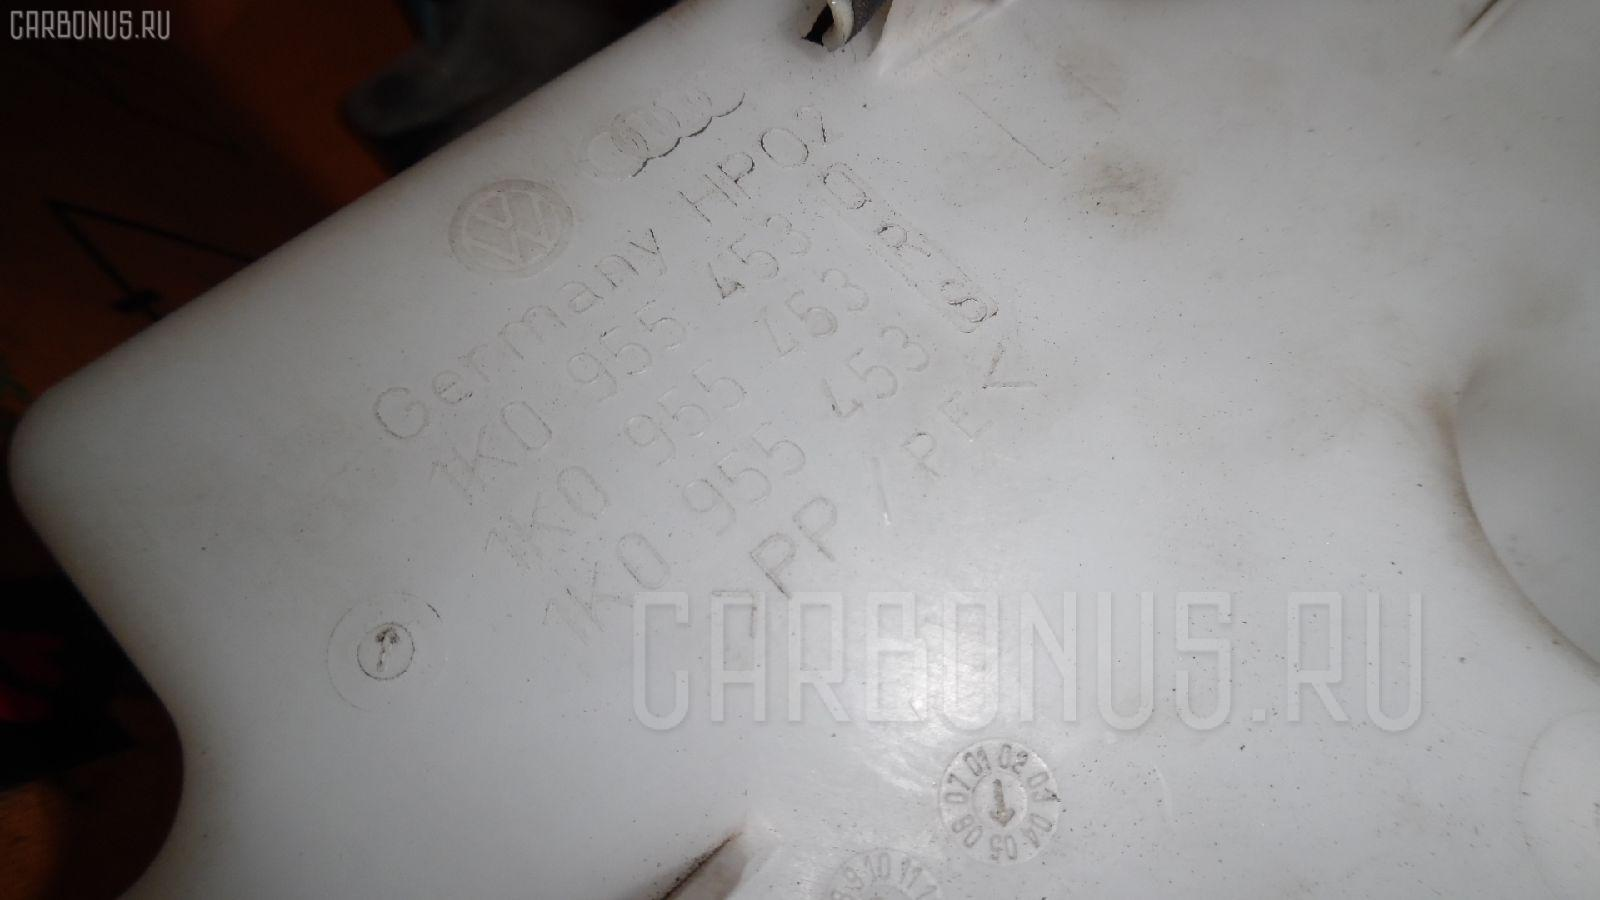 Бачок омывателя AUDI A3 SPORTBACK 8PBLR Фото 1